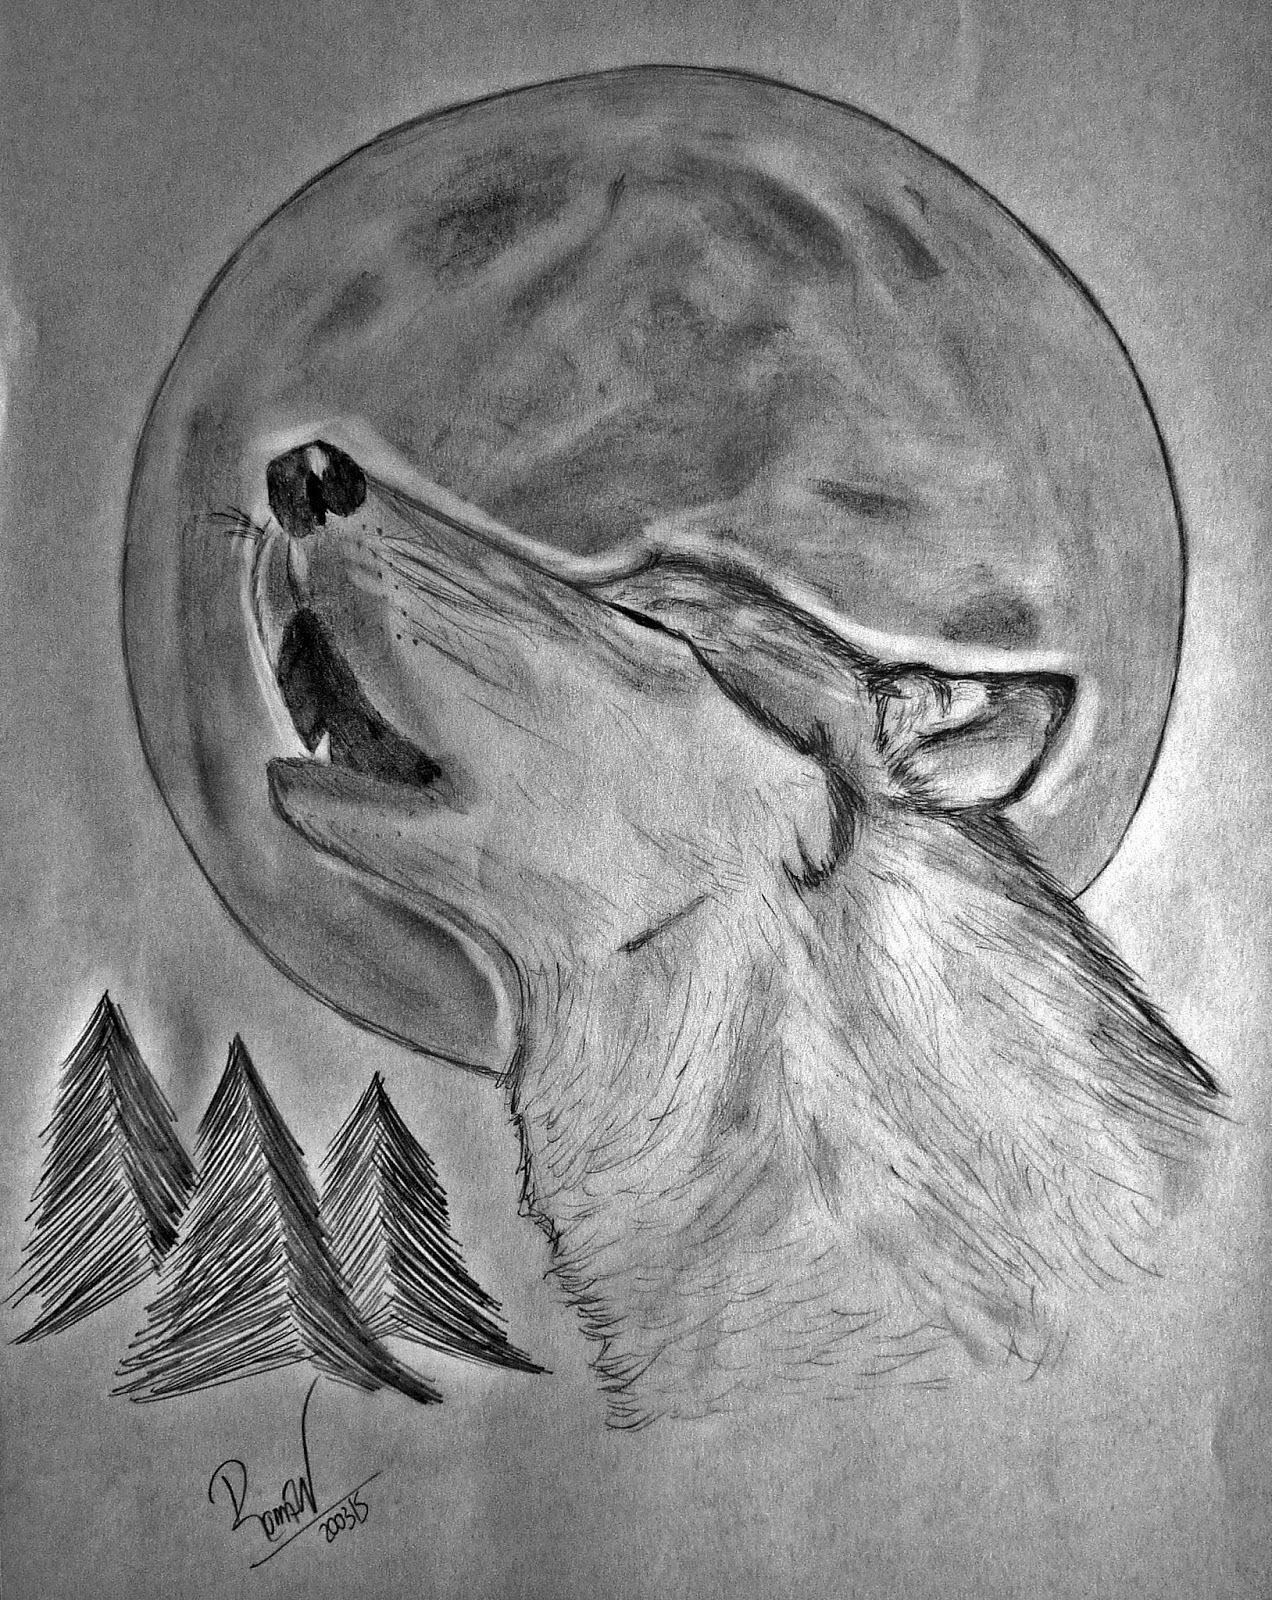 Resultado de imagen para lobos aullando dibujos a lapiz  DIBUJO